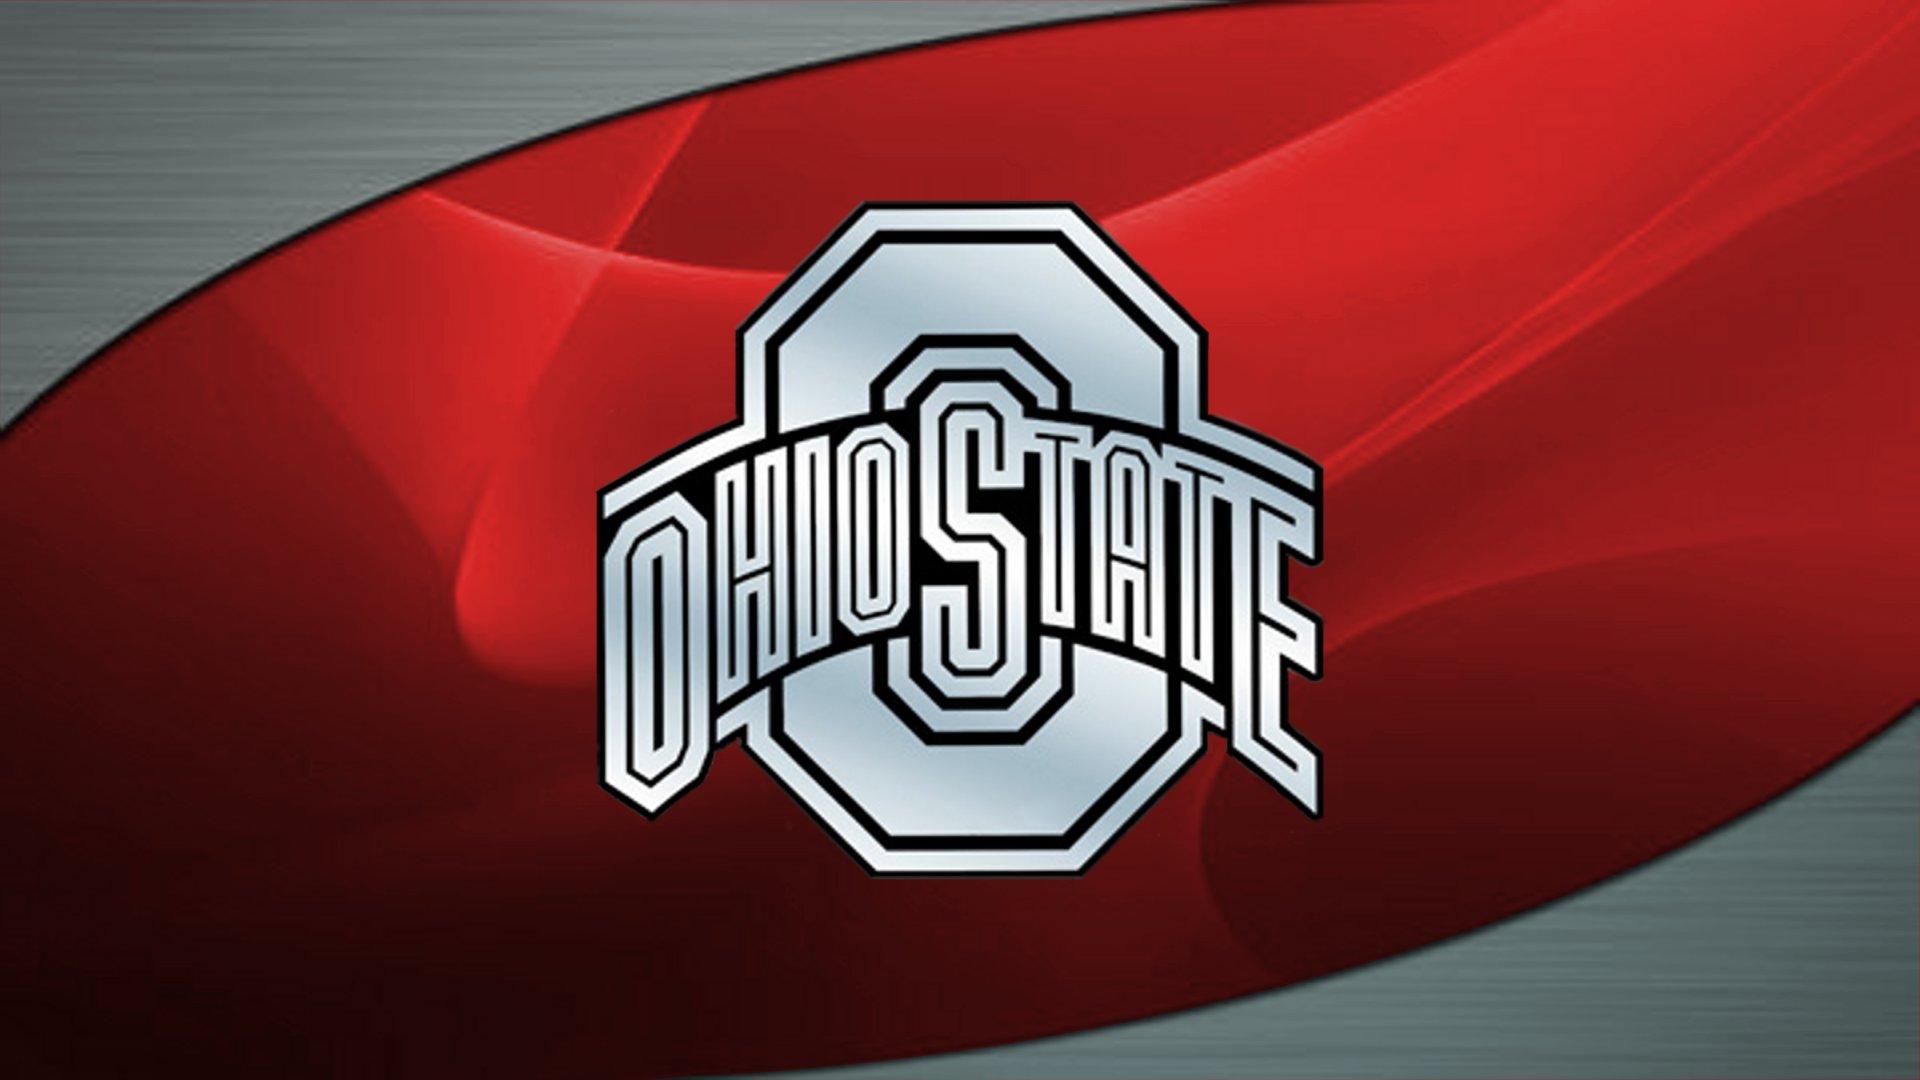 OSU Wallpaper 45   Ohio State Football Wallpaper 29249112 1920x1080